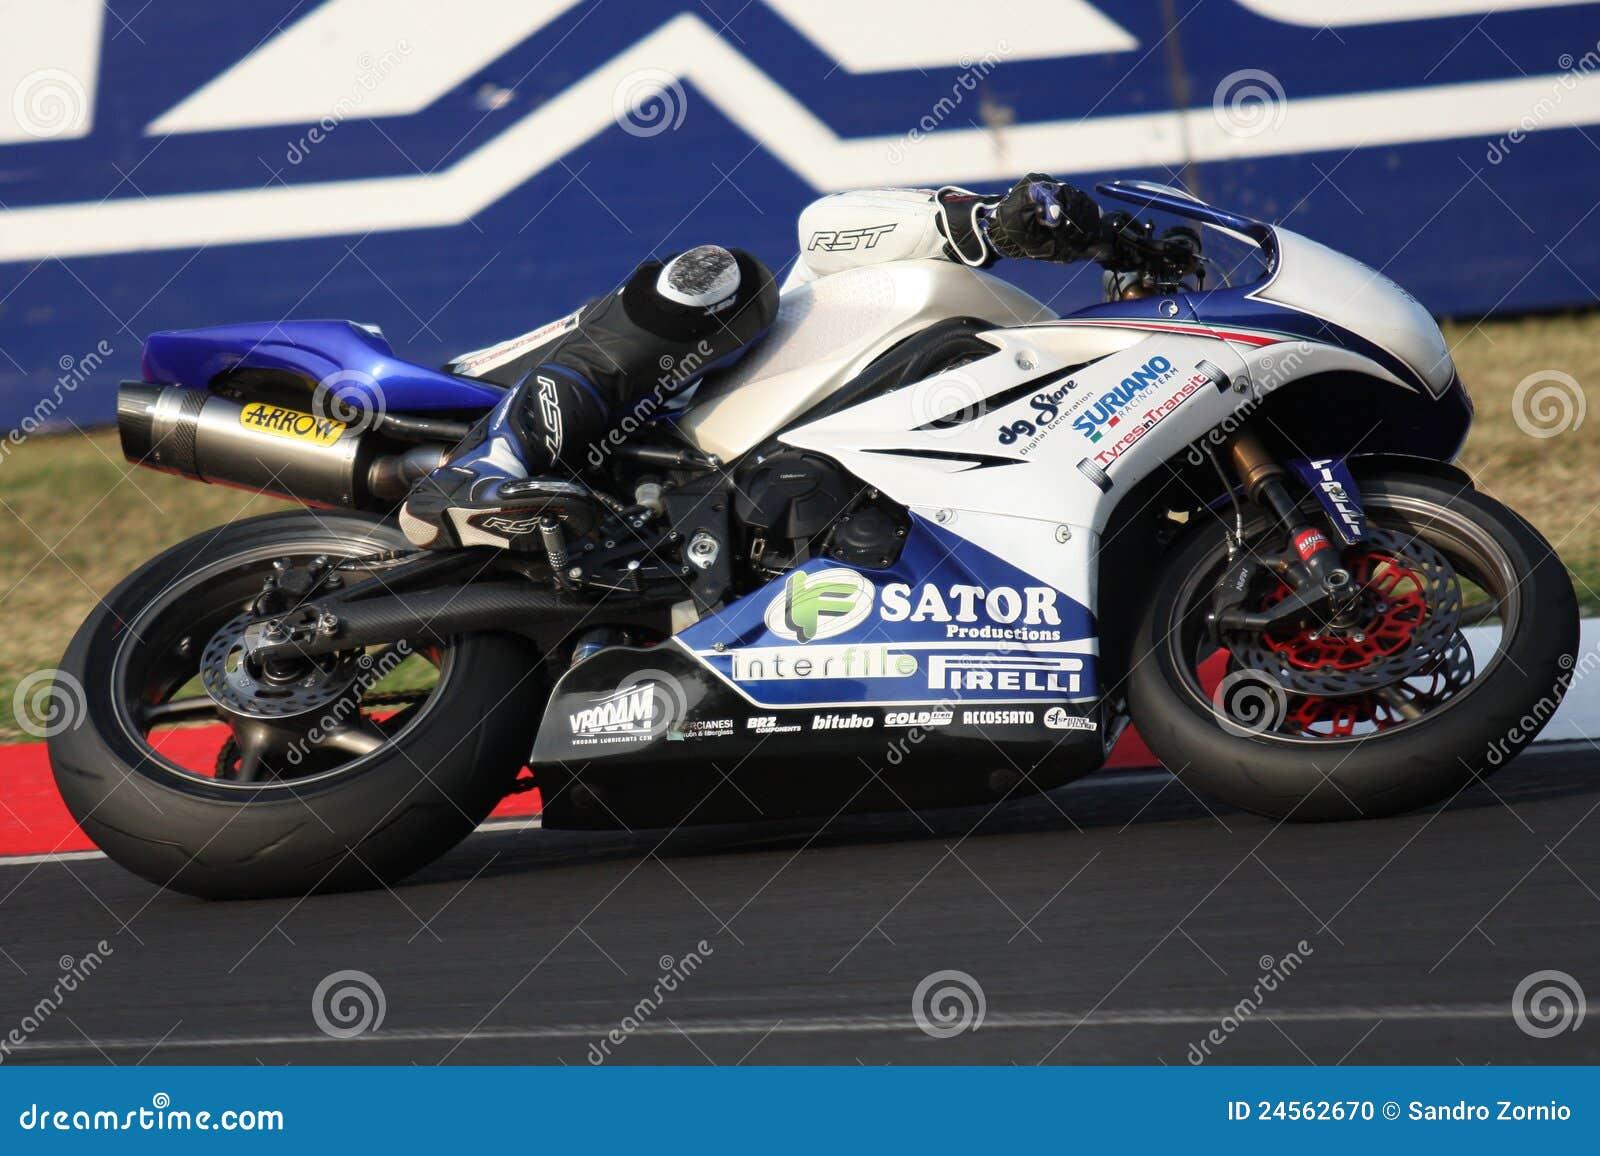 Ronan Quarnby Triumph Daytona 675 Suriano